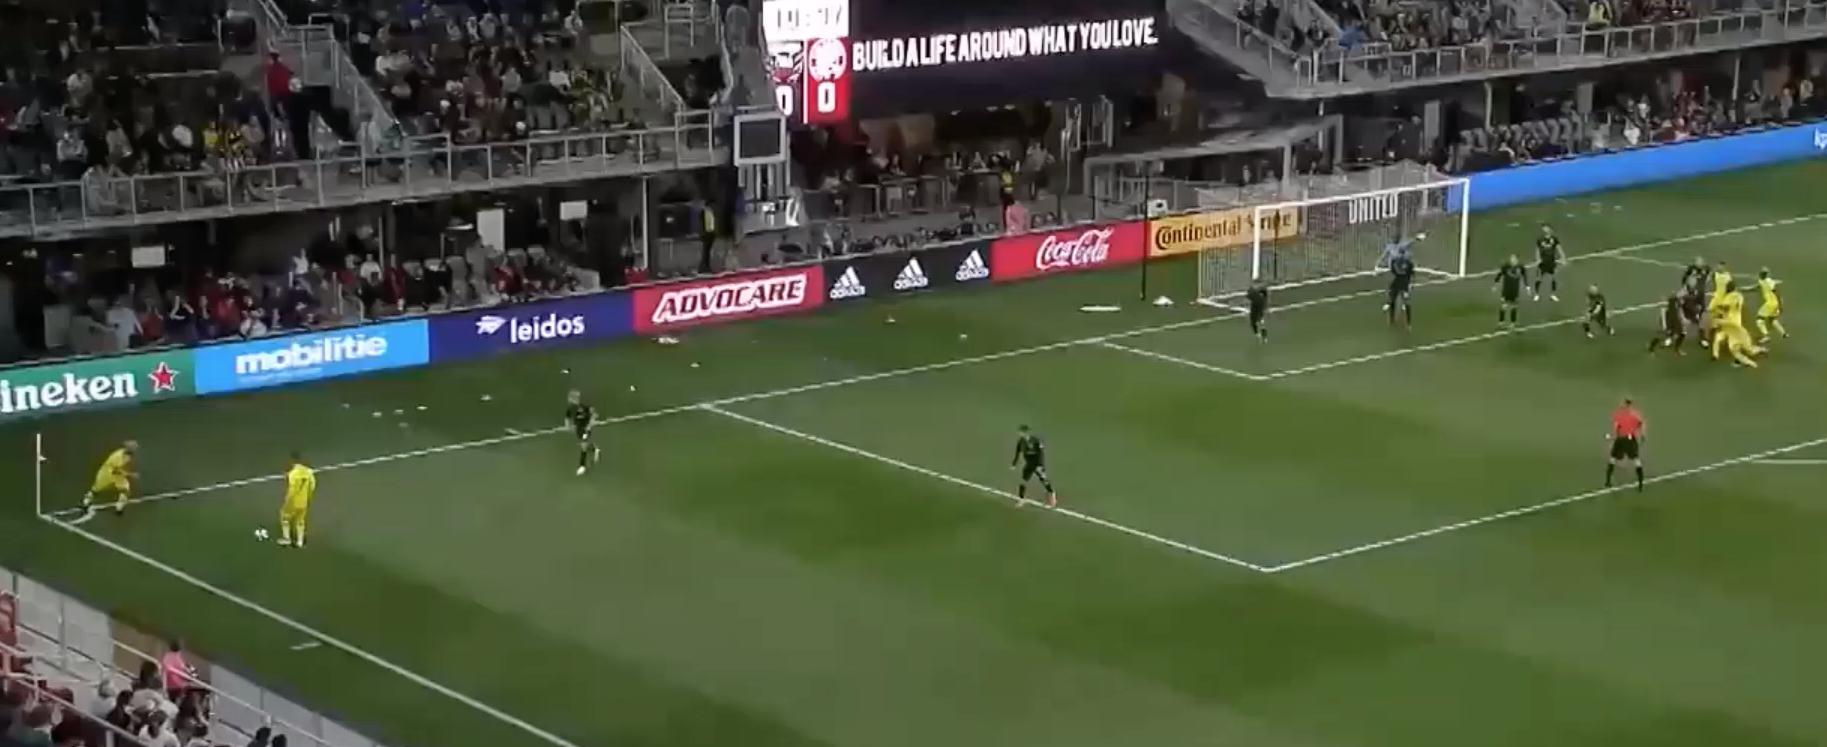 The defensive set-up on this corner kick